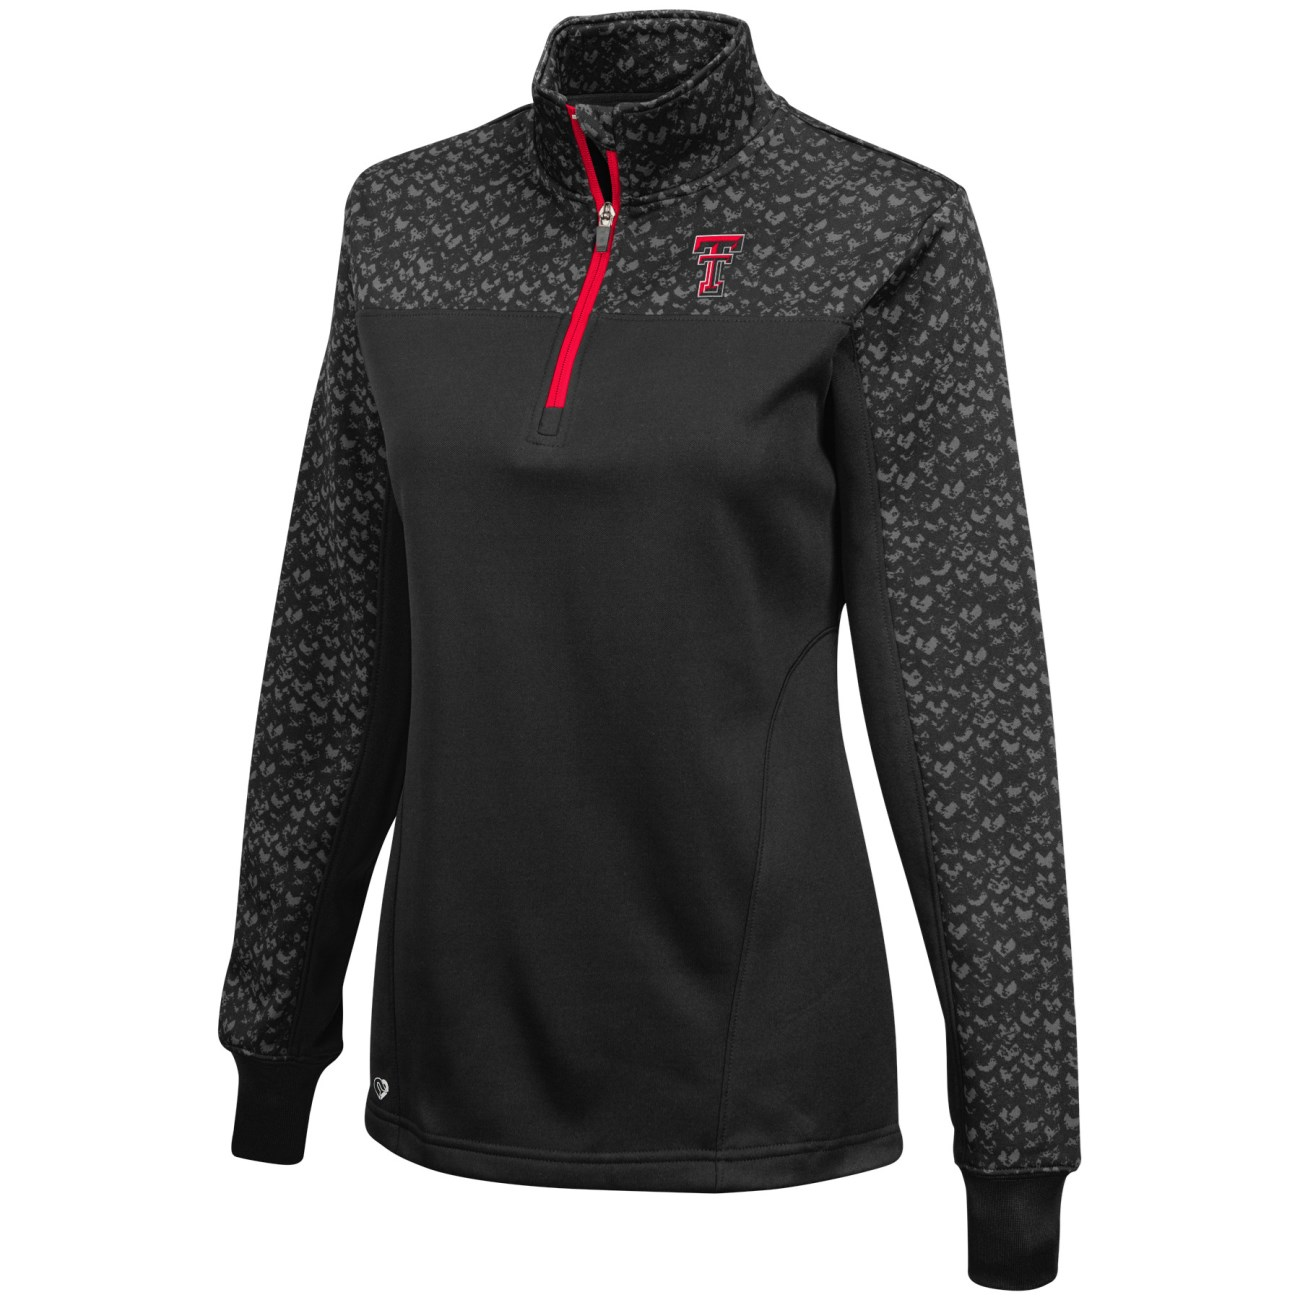 "Texas Tech Red Raiders Women's NCAA ""Burst"" 1/4 Zip Pullover Sweatshirt"